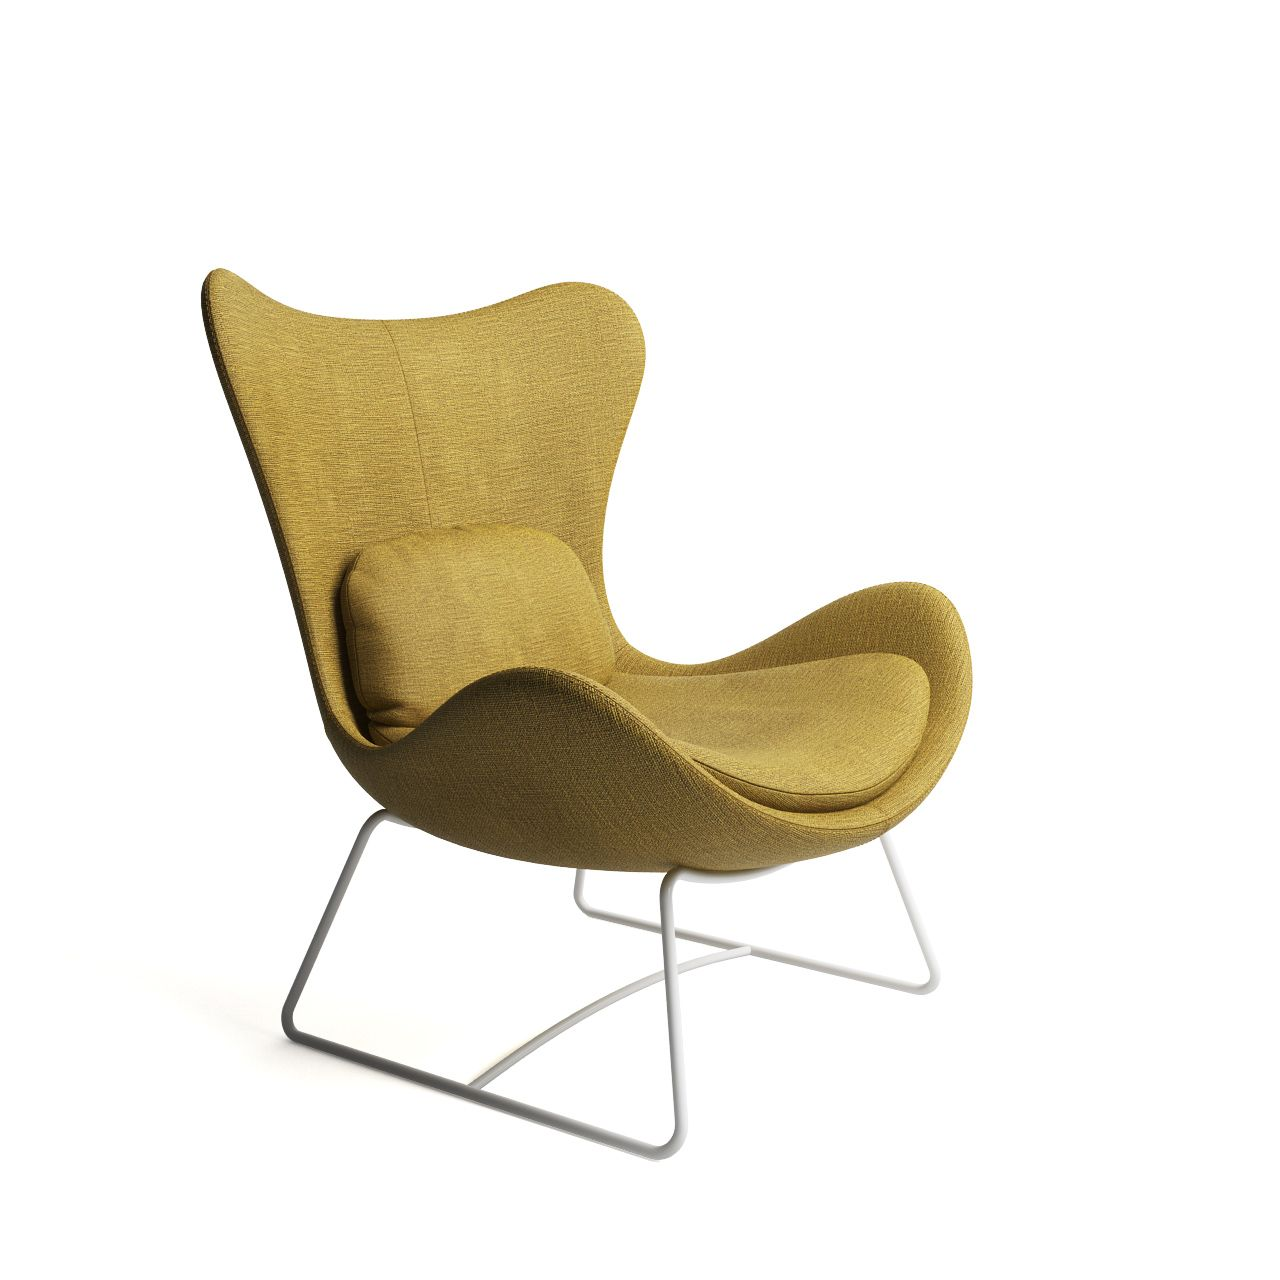 Pleasant Lazy Armchair By Calligaris Chair Eames Dining Chair Machost Co Dining Chair Design Ideas Machostcouk